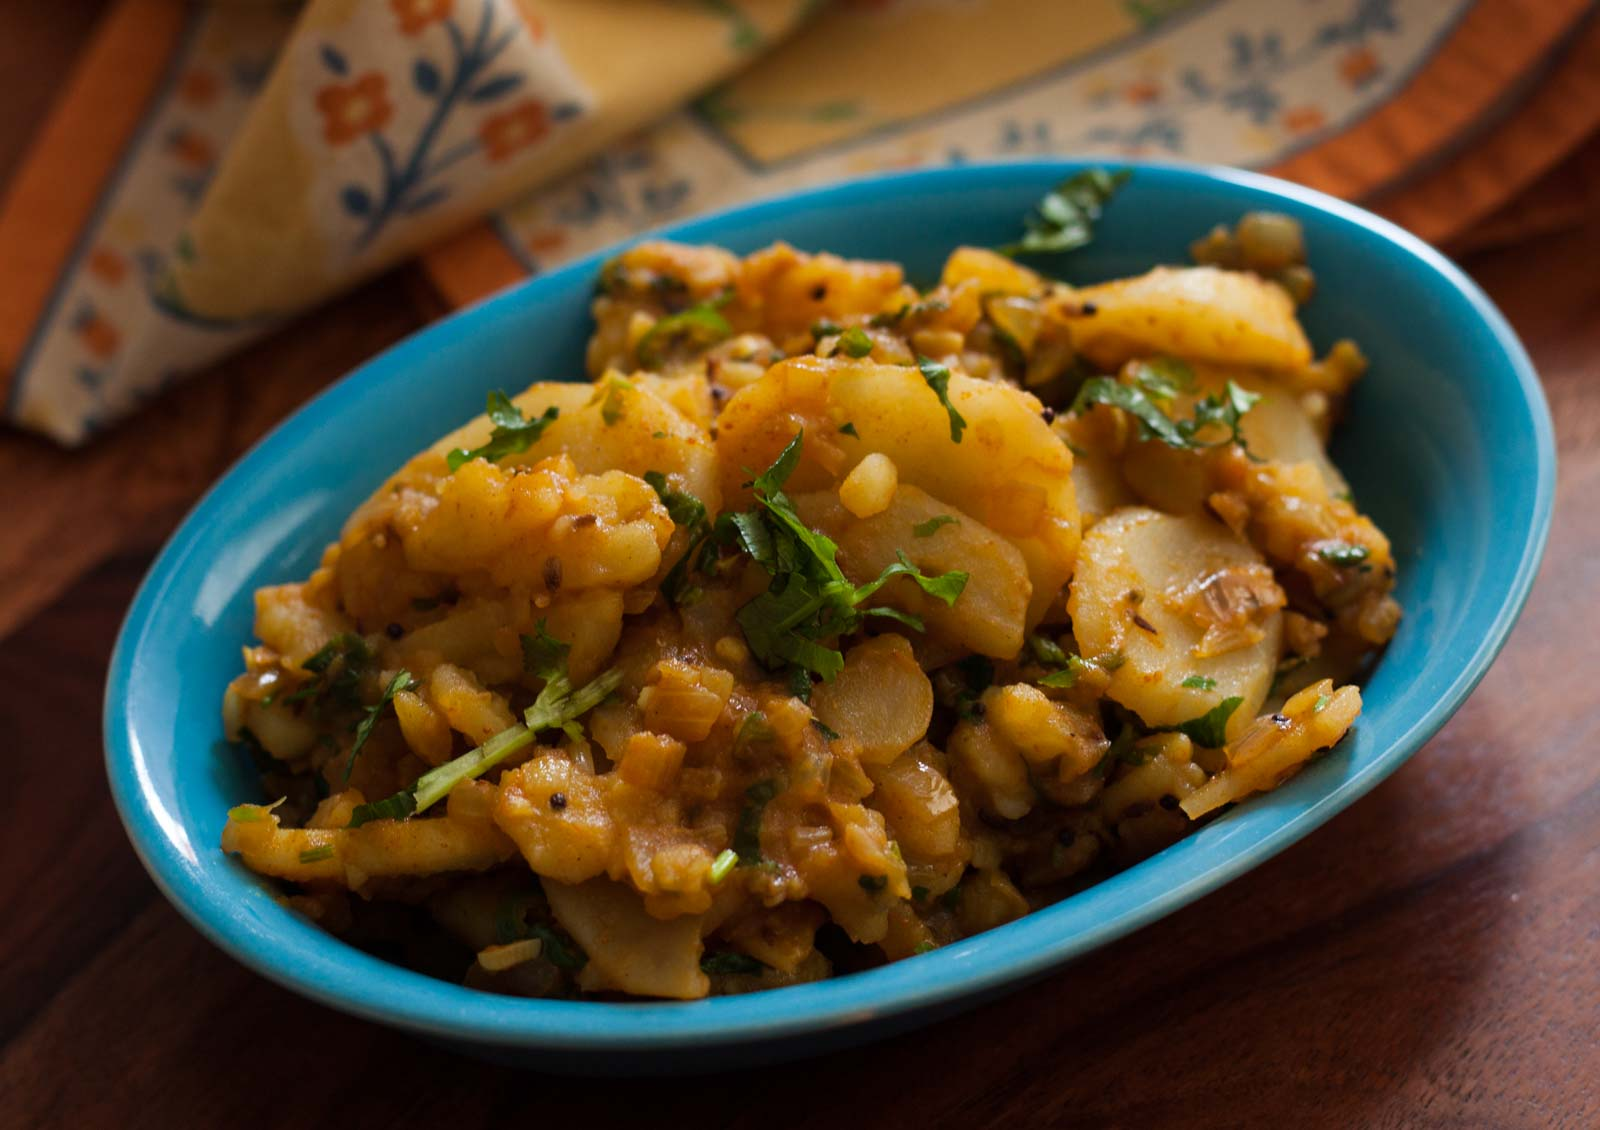 Maharashtrian aloo bhujne recipe potato stir fry by archanas maharashtrian aloo bhujne recipe potato stir fry forumfinder Images